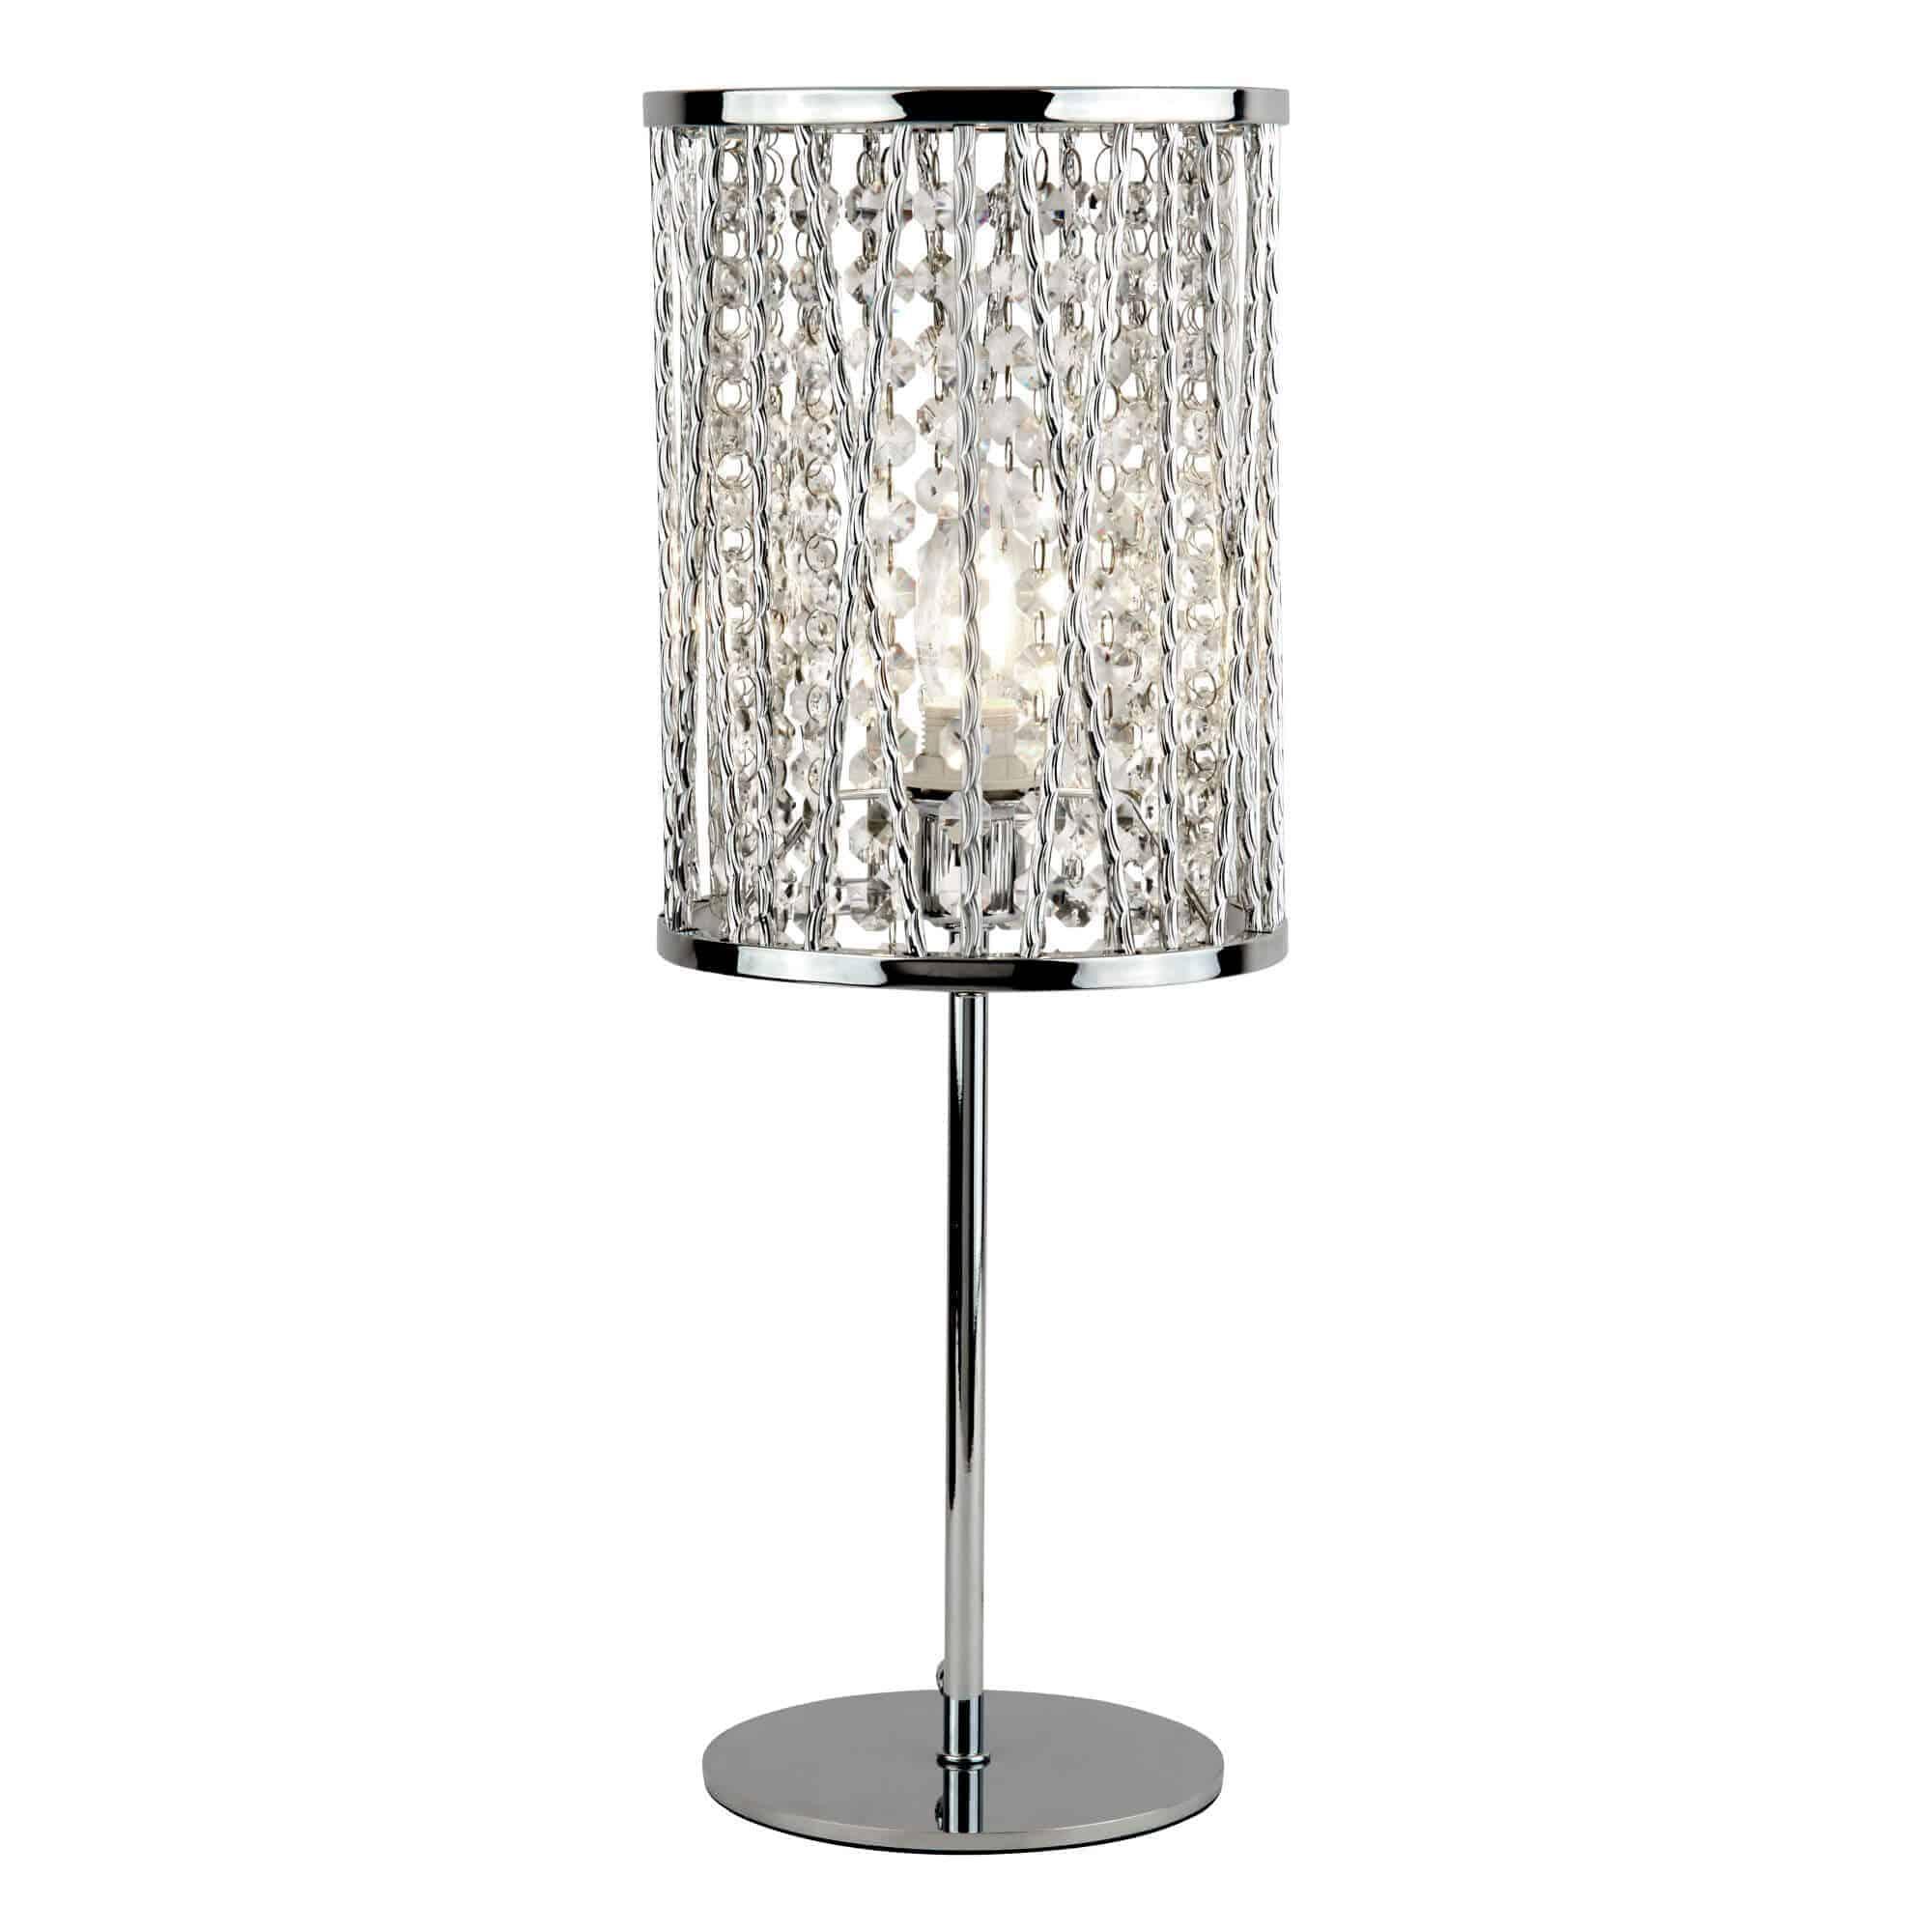 8931CC – Searchlight Elise Polished Chrome 1 Light Table Lamp